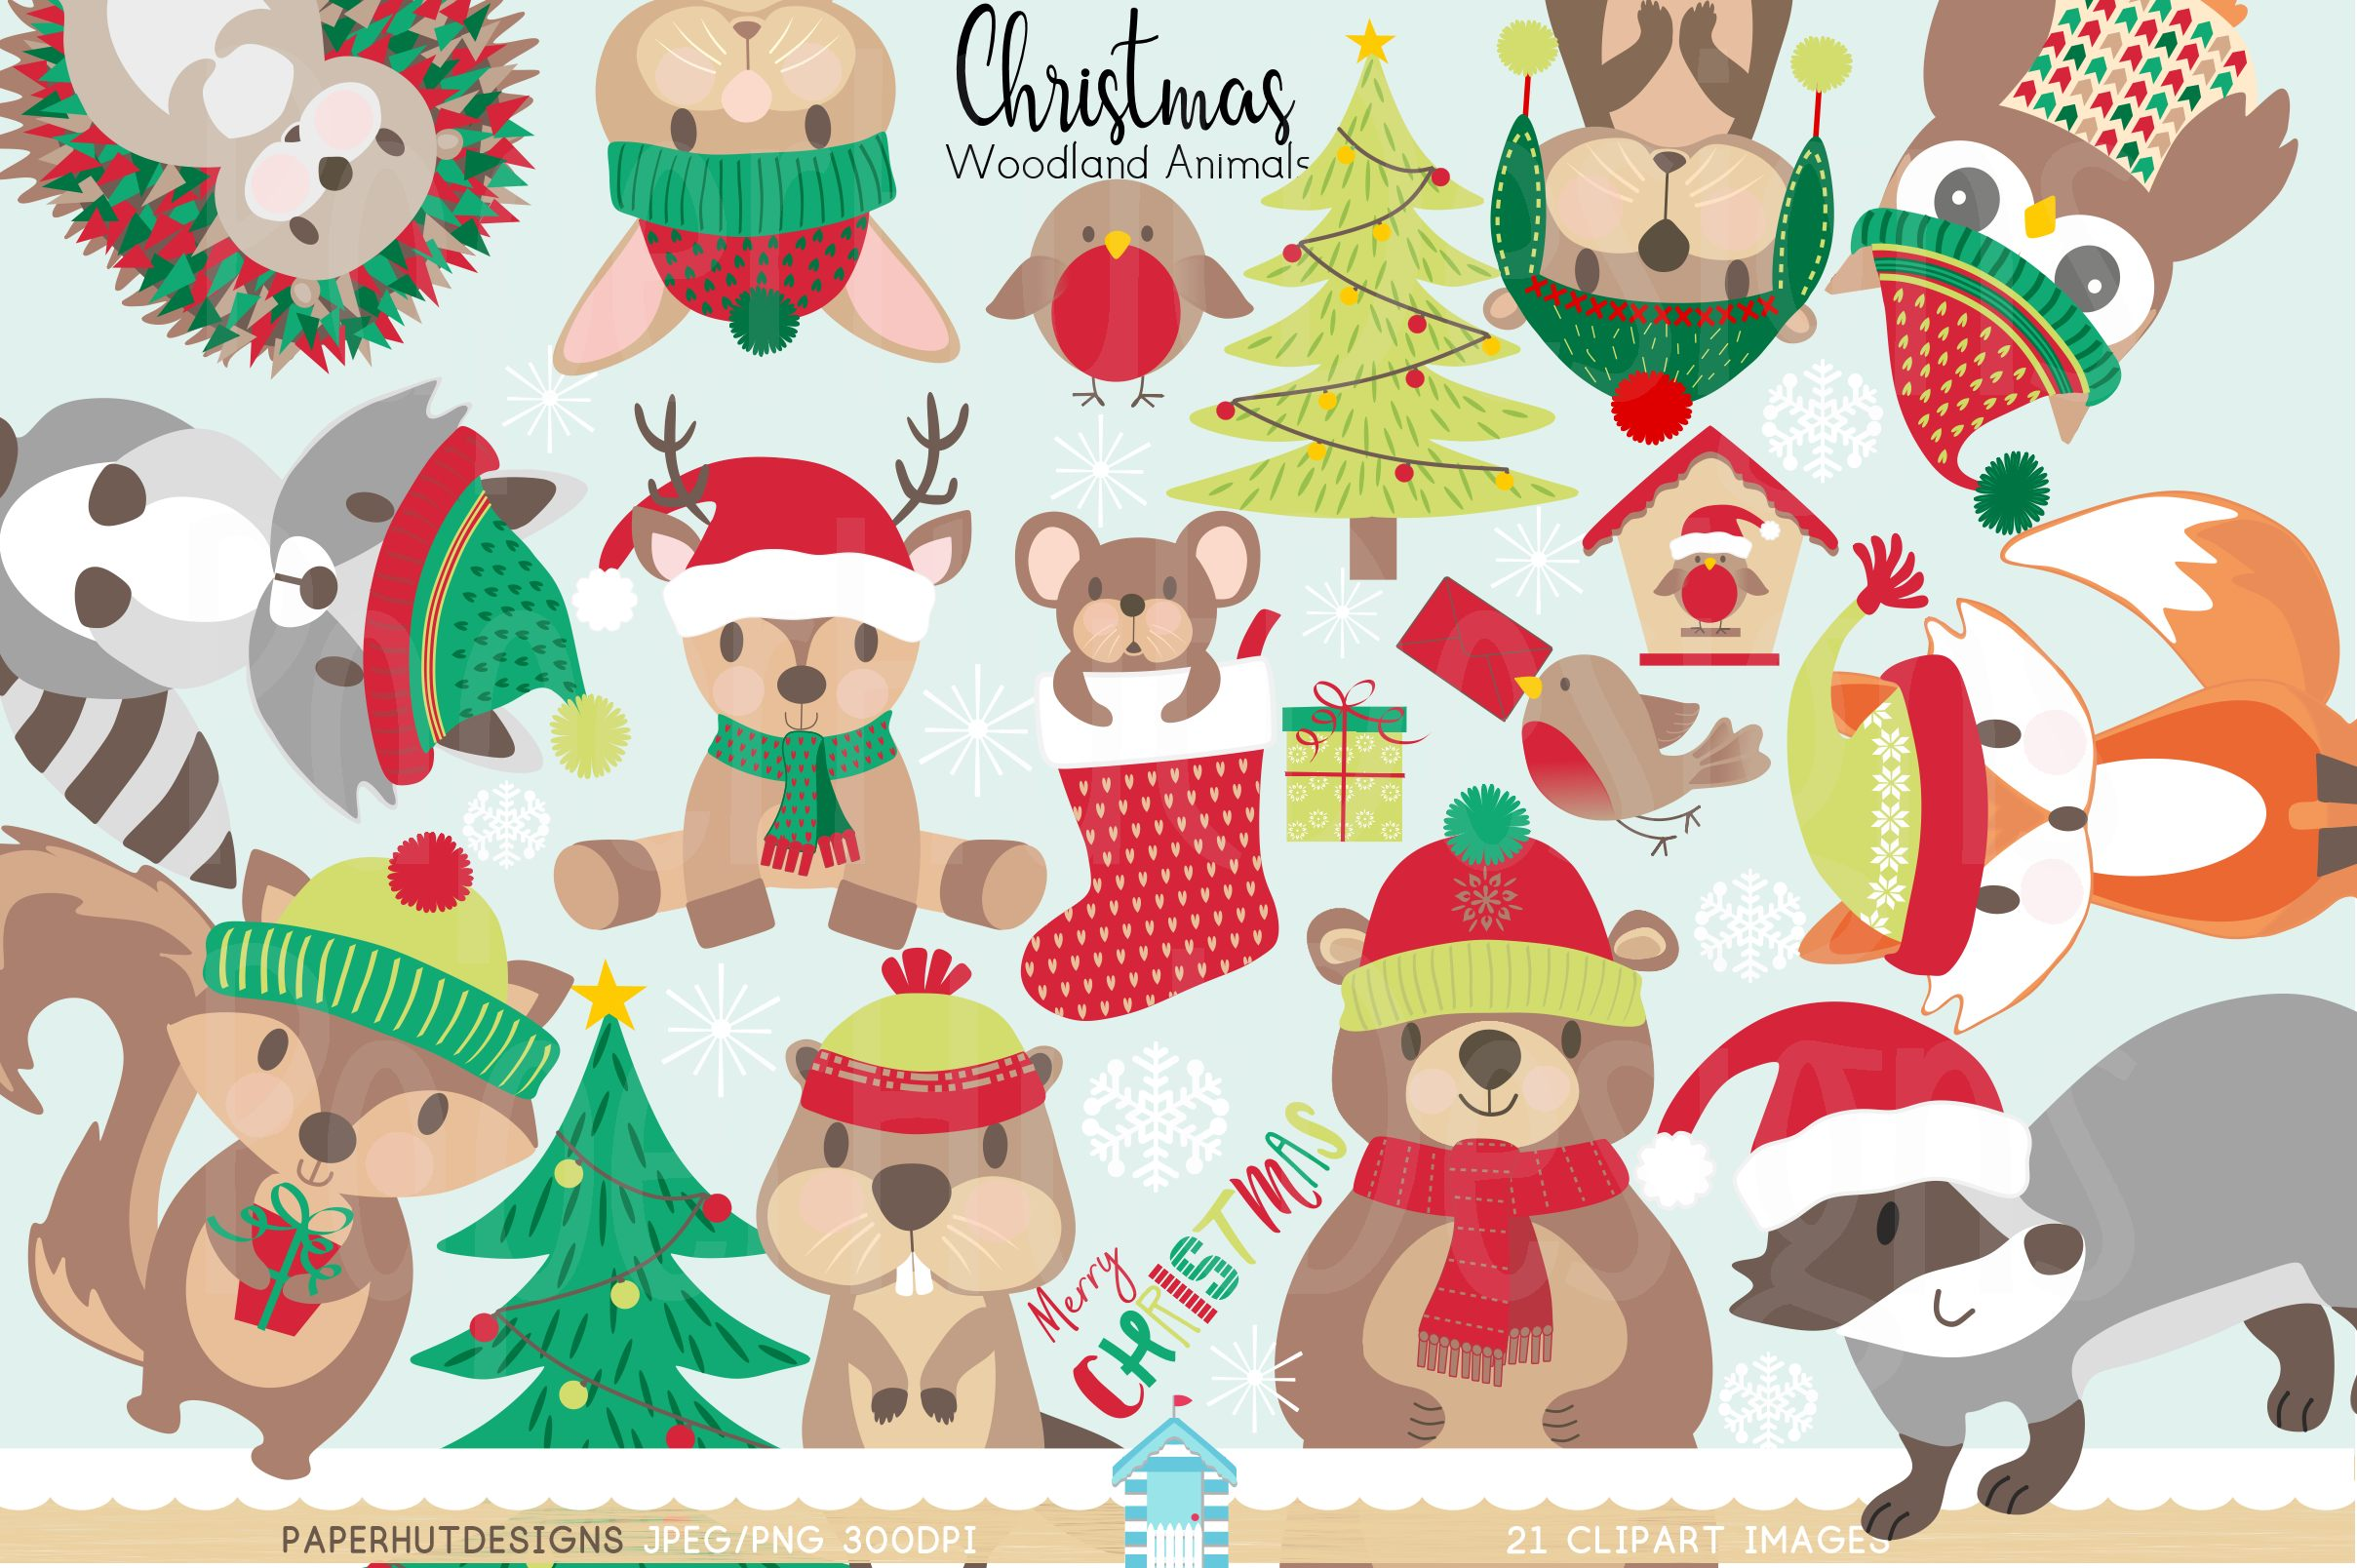 Christmas Woodland Animals Clipart example image 1